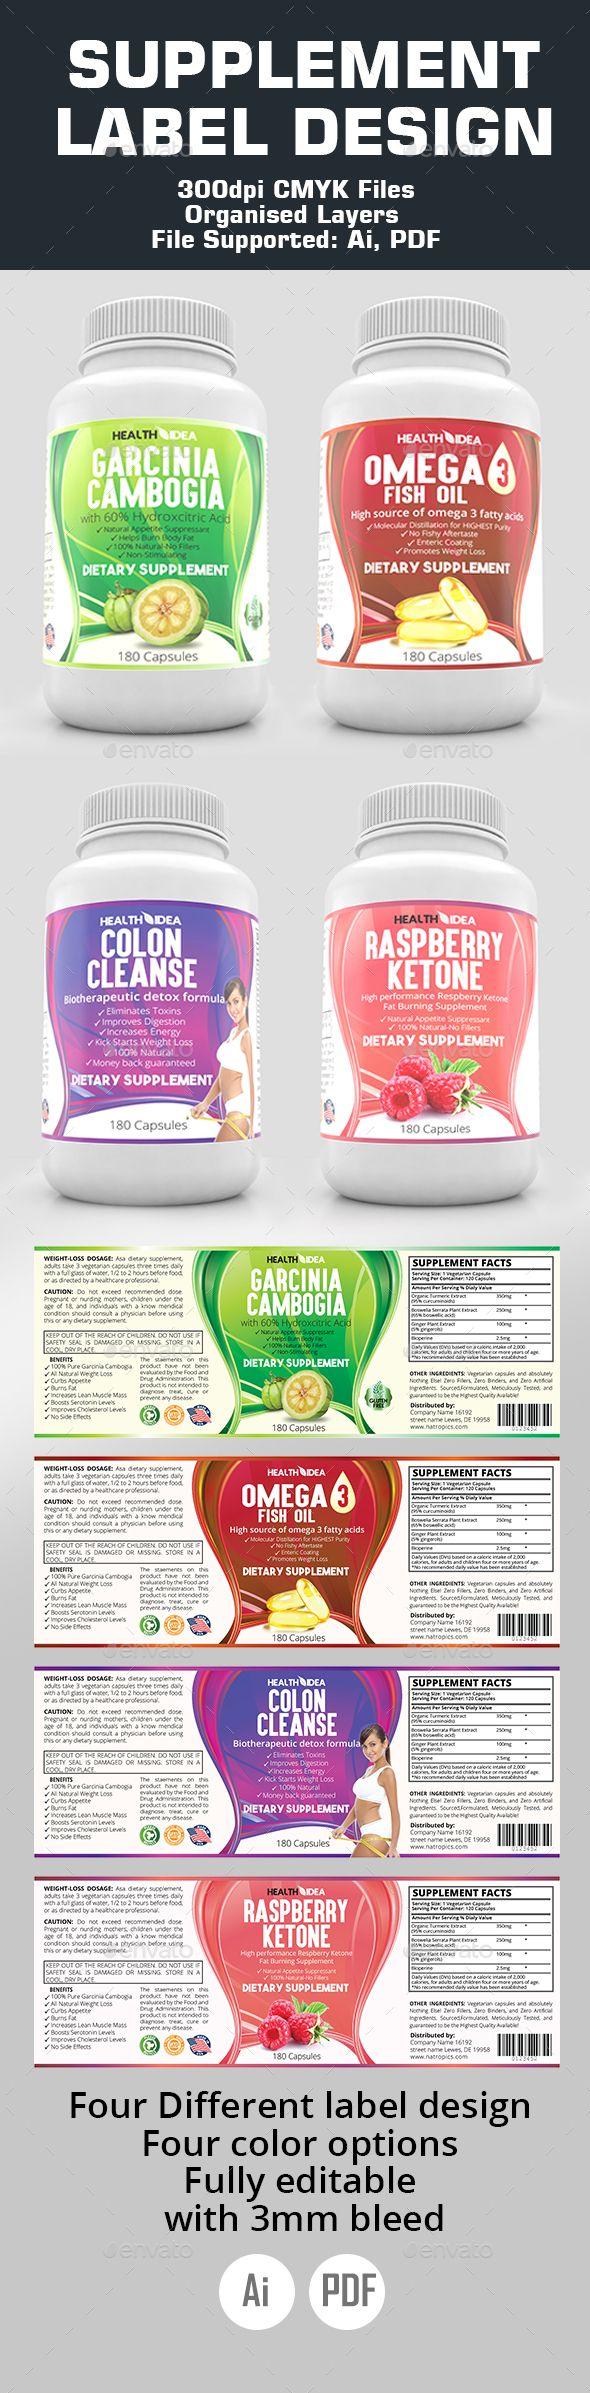 226 best Supplements Packaging images on Pinterest   Design ...